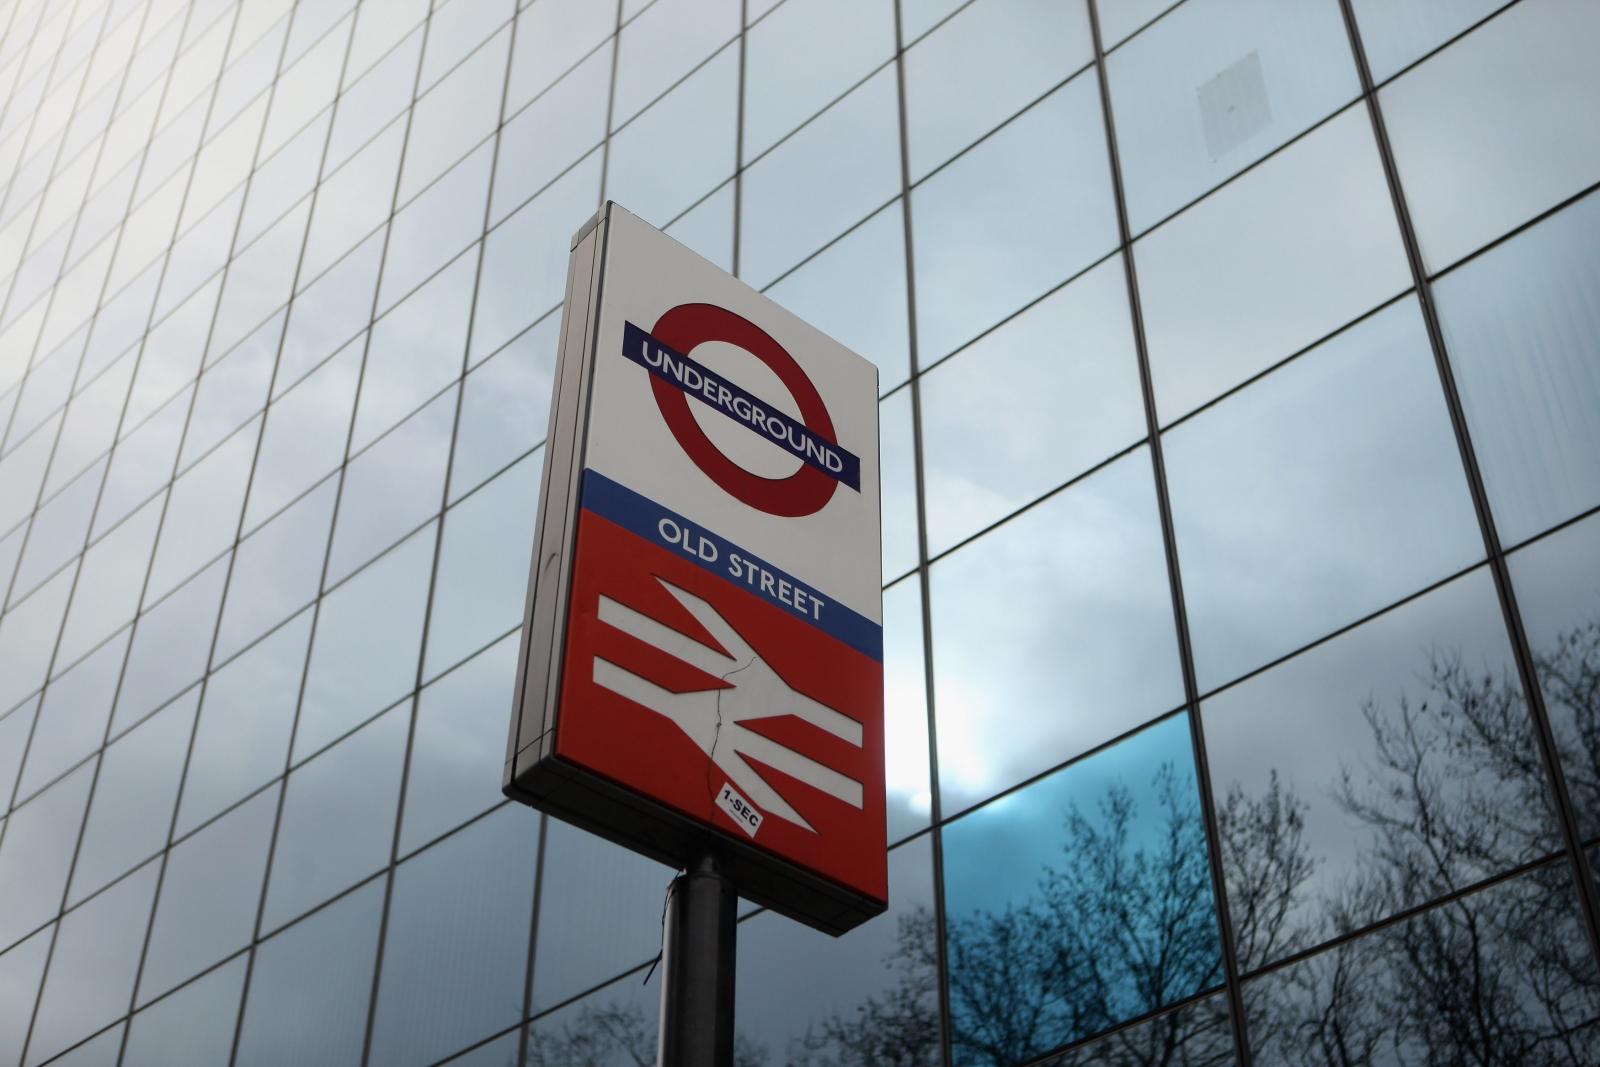 London Old Street station